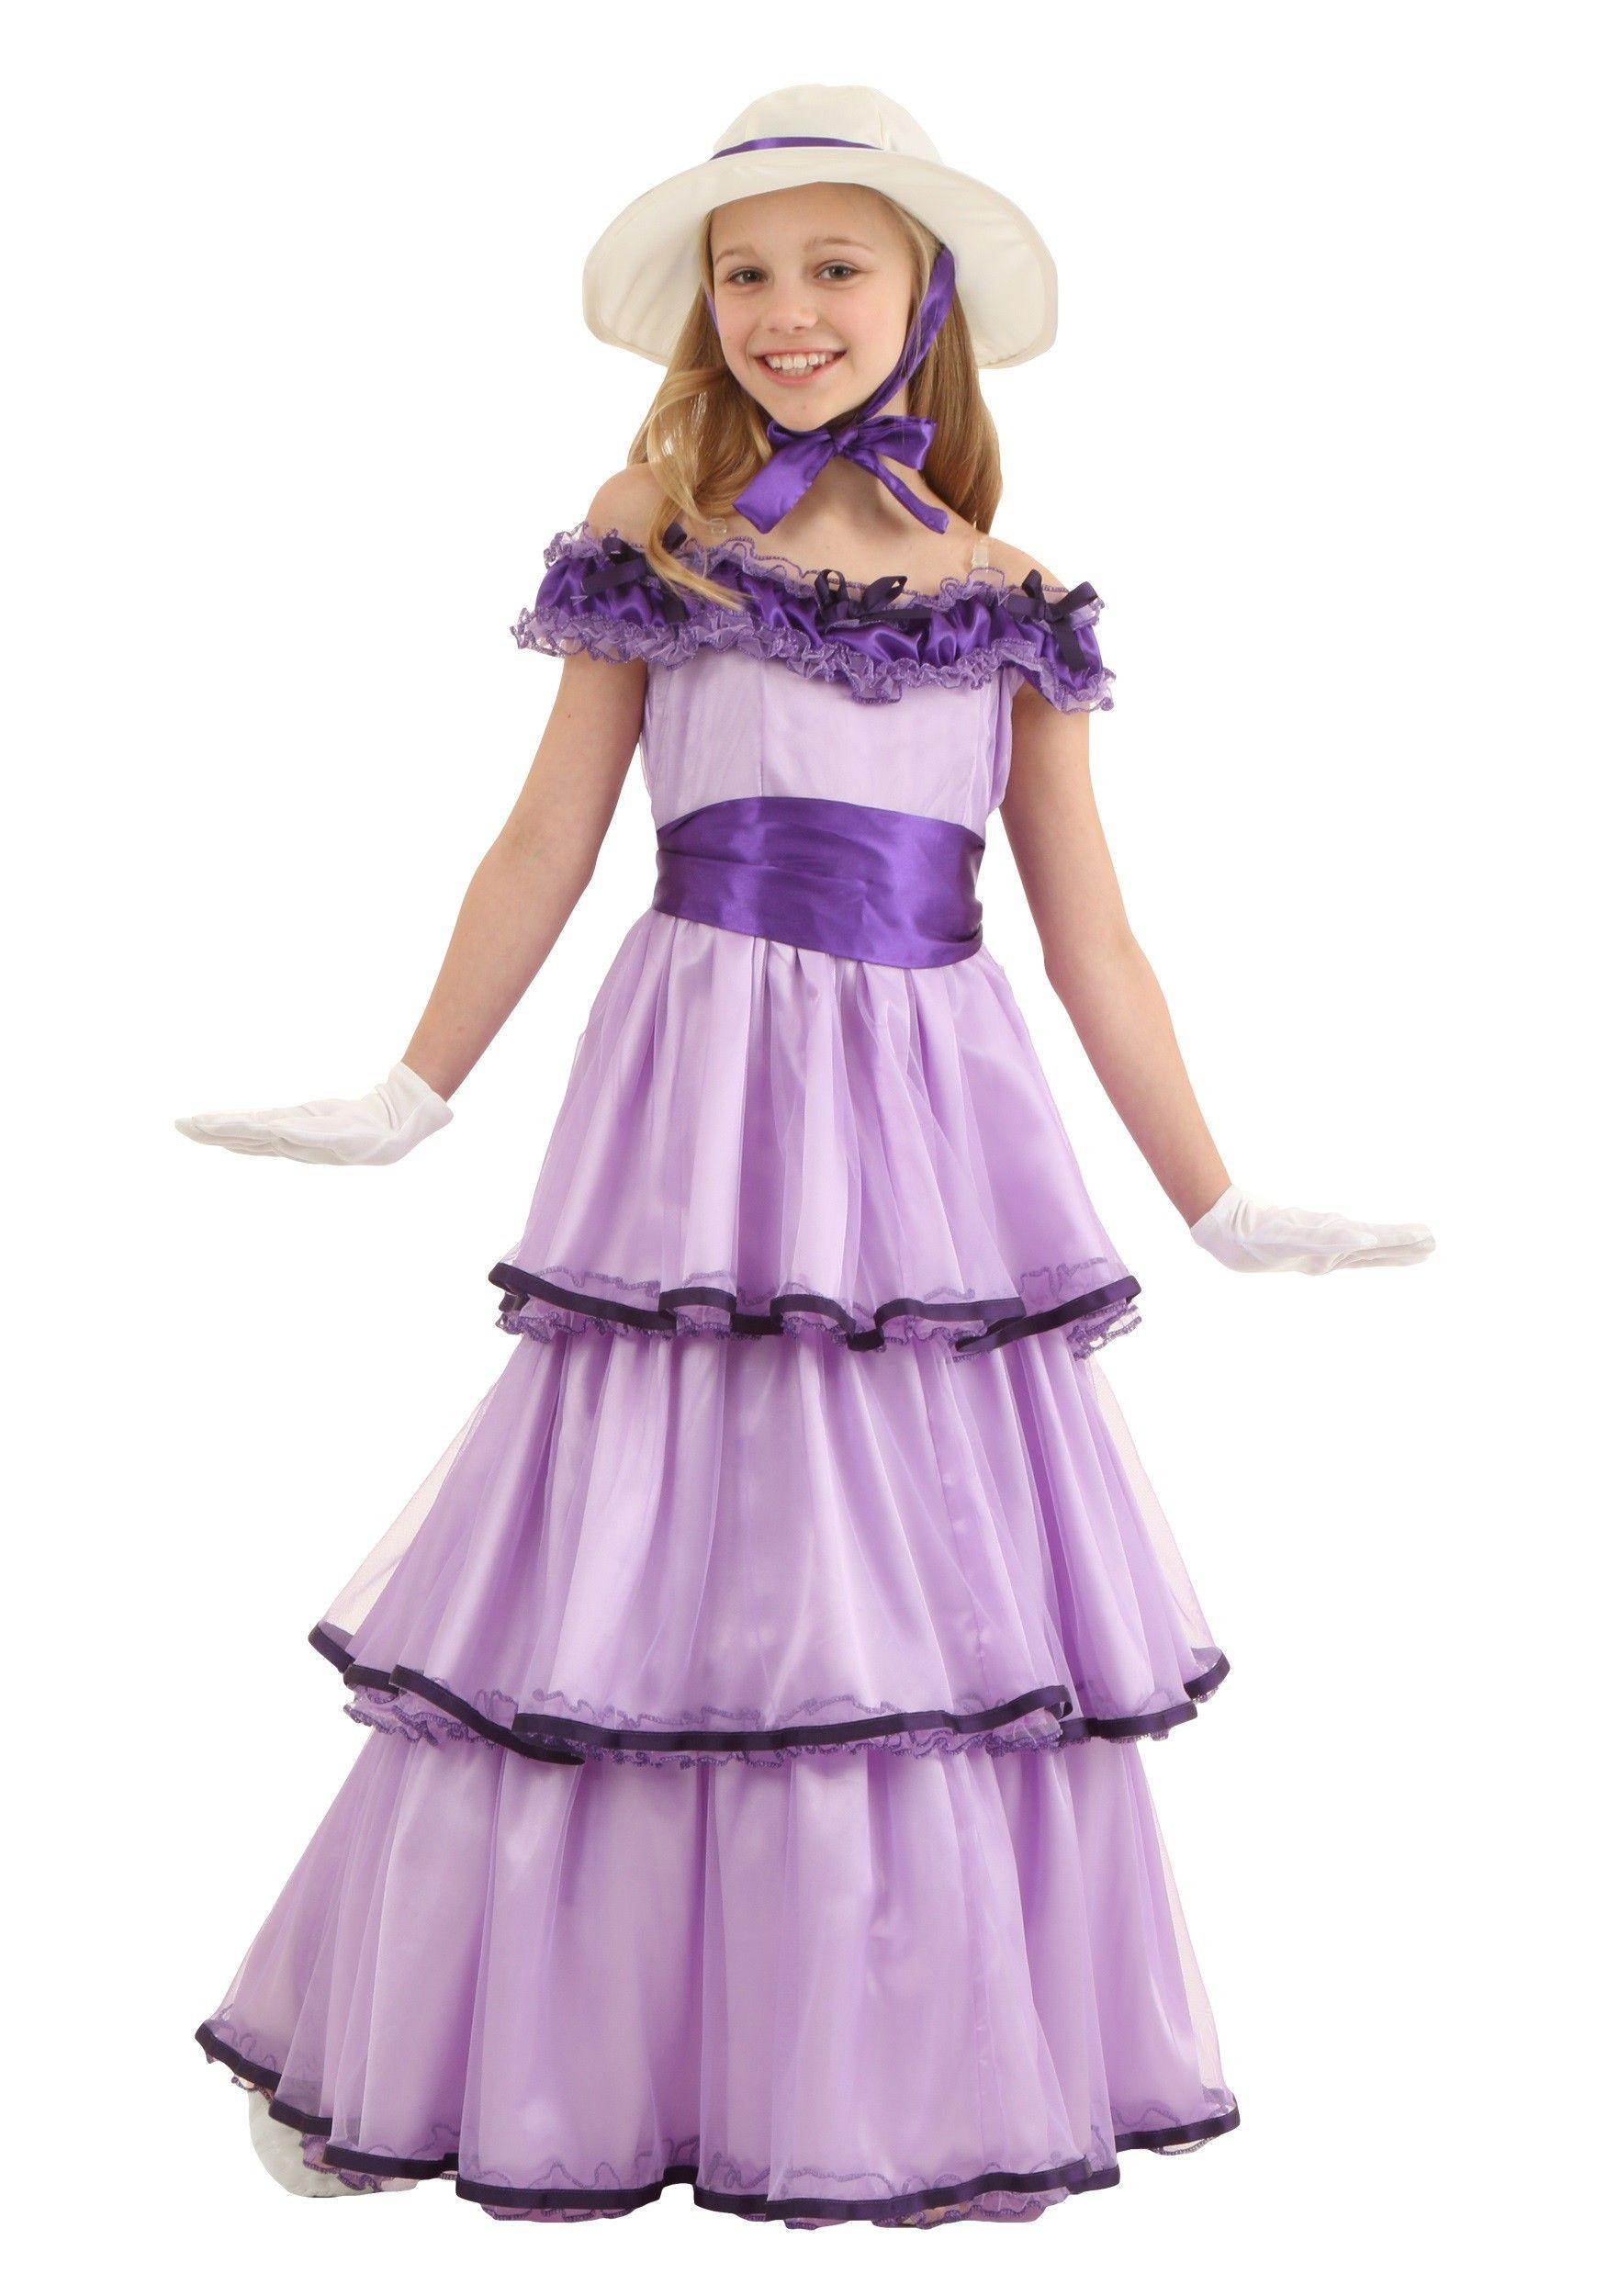 Moderno Vestido De Novia De La Princesa Cenicienta De Disney Foto ...